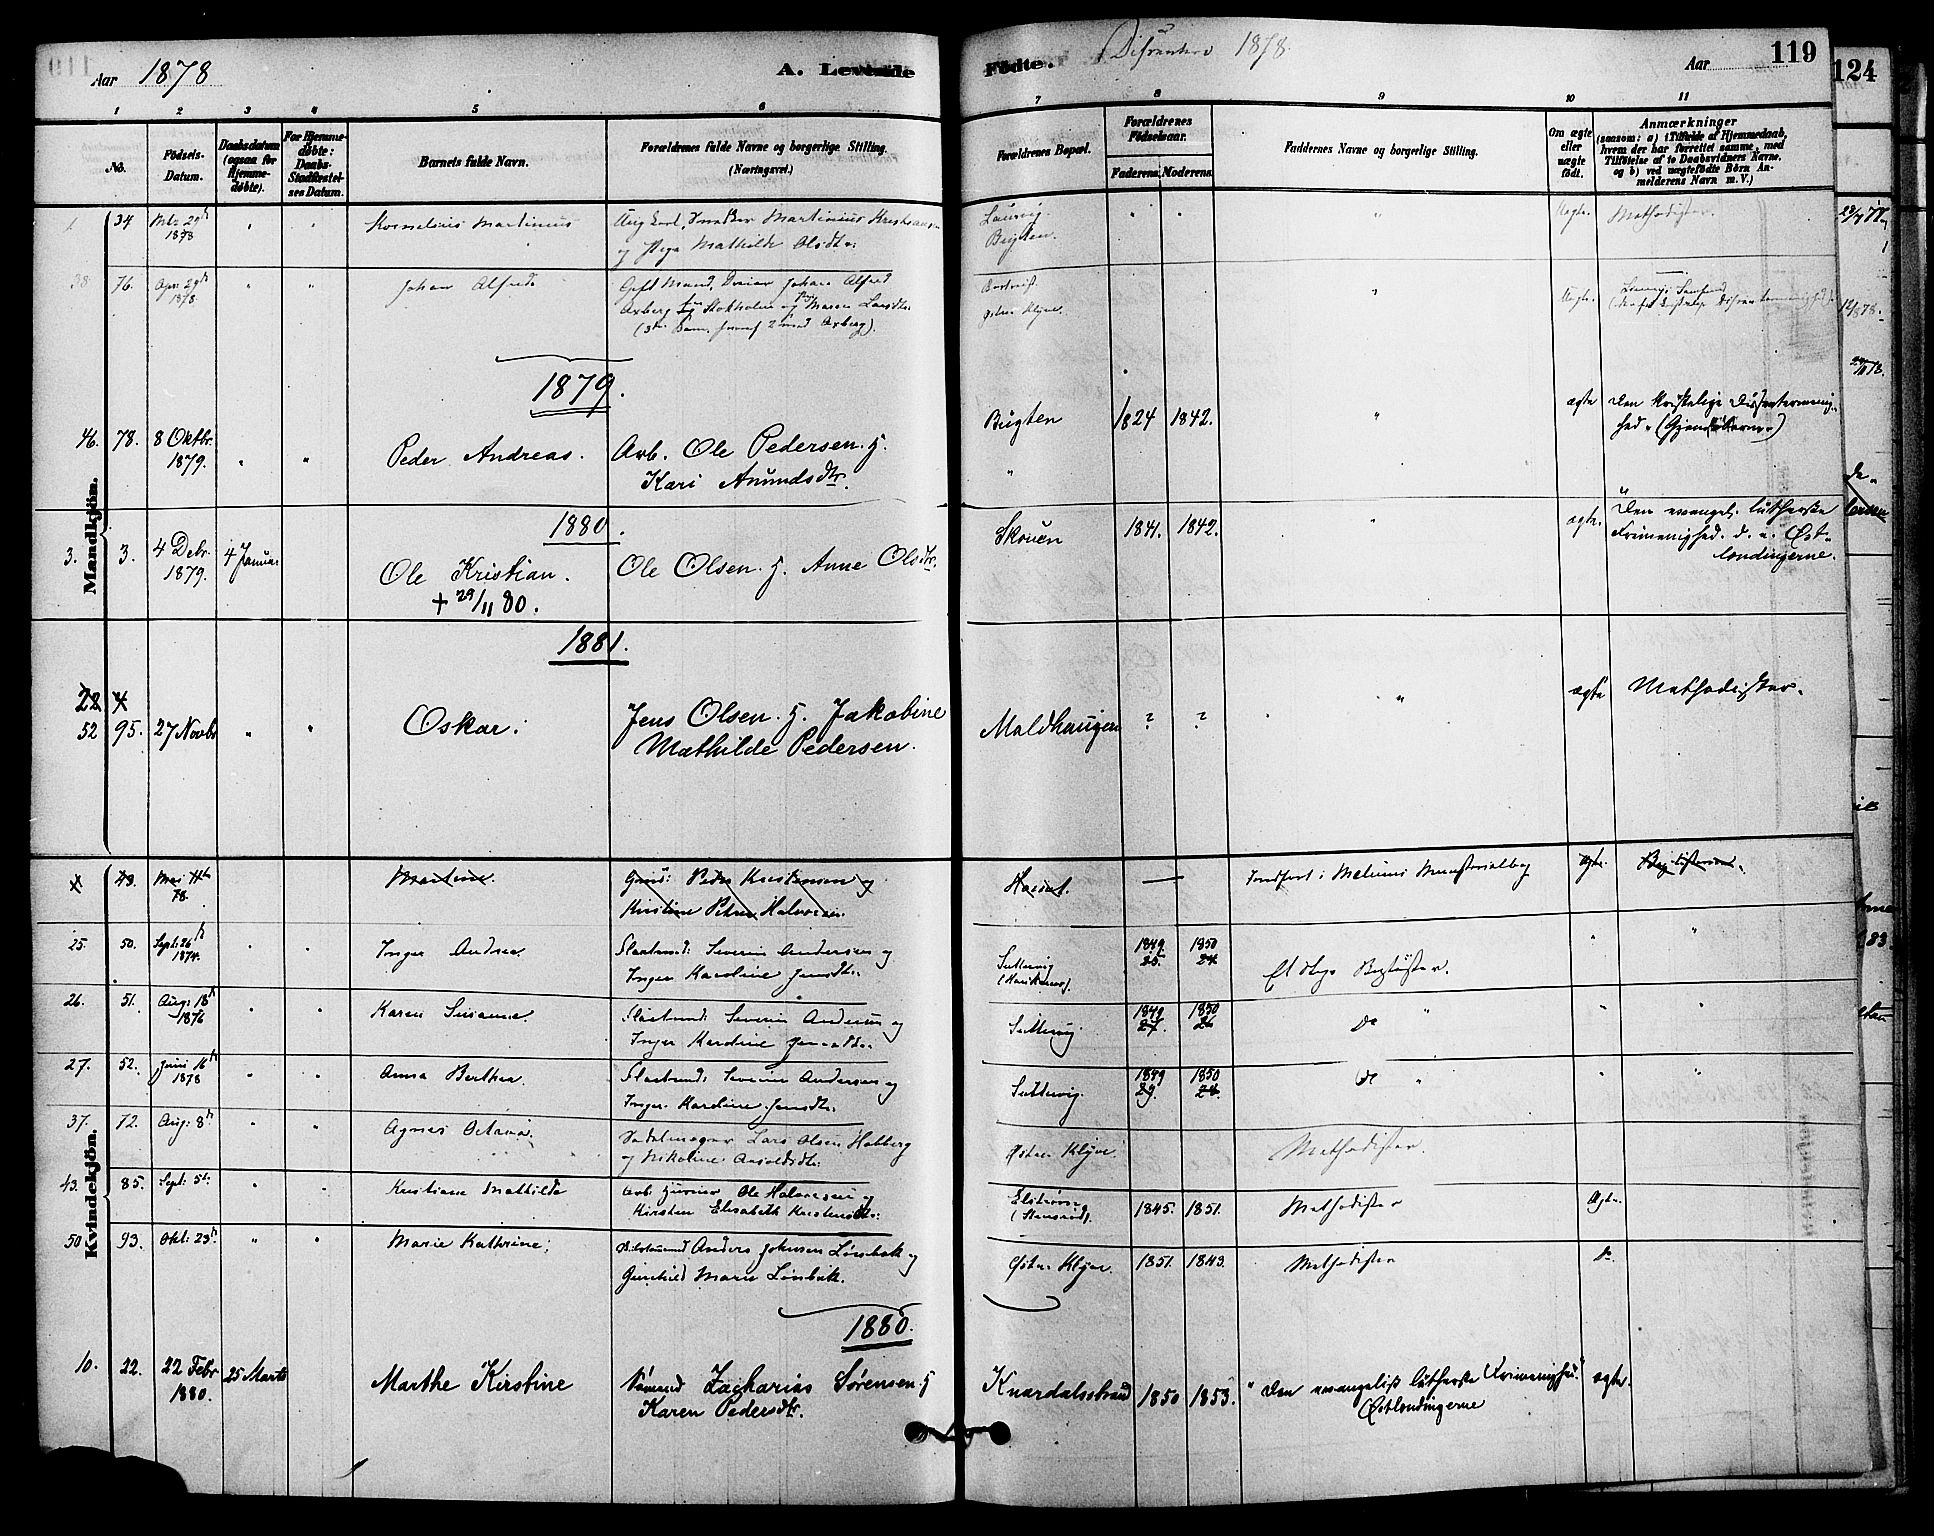 SAKO, Solum kirkebøker, F/Fa/L0009: Ministerialbok nr. I 9, 1877-1887, s. 119